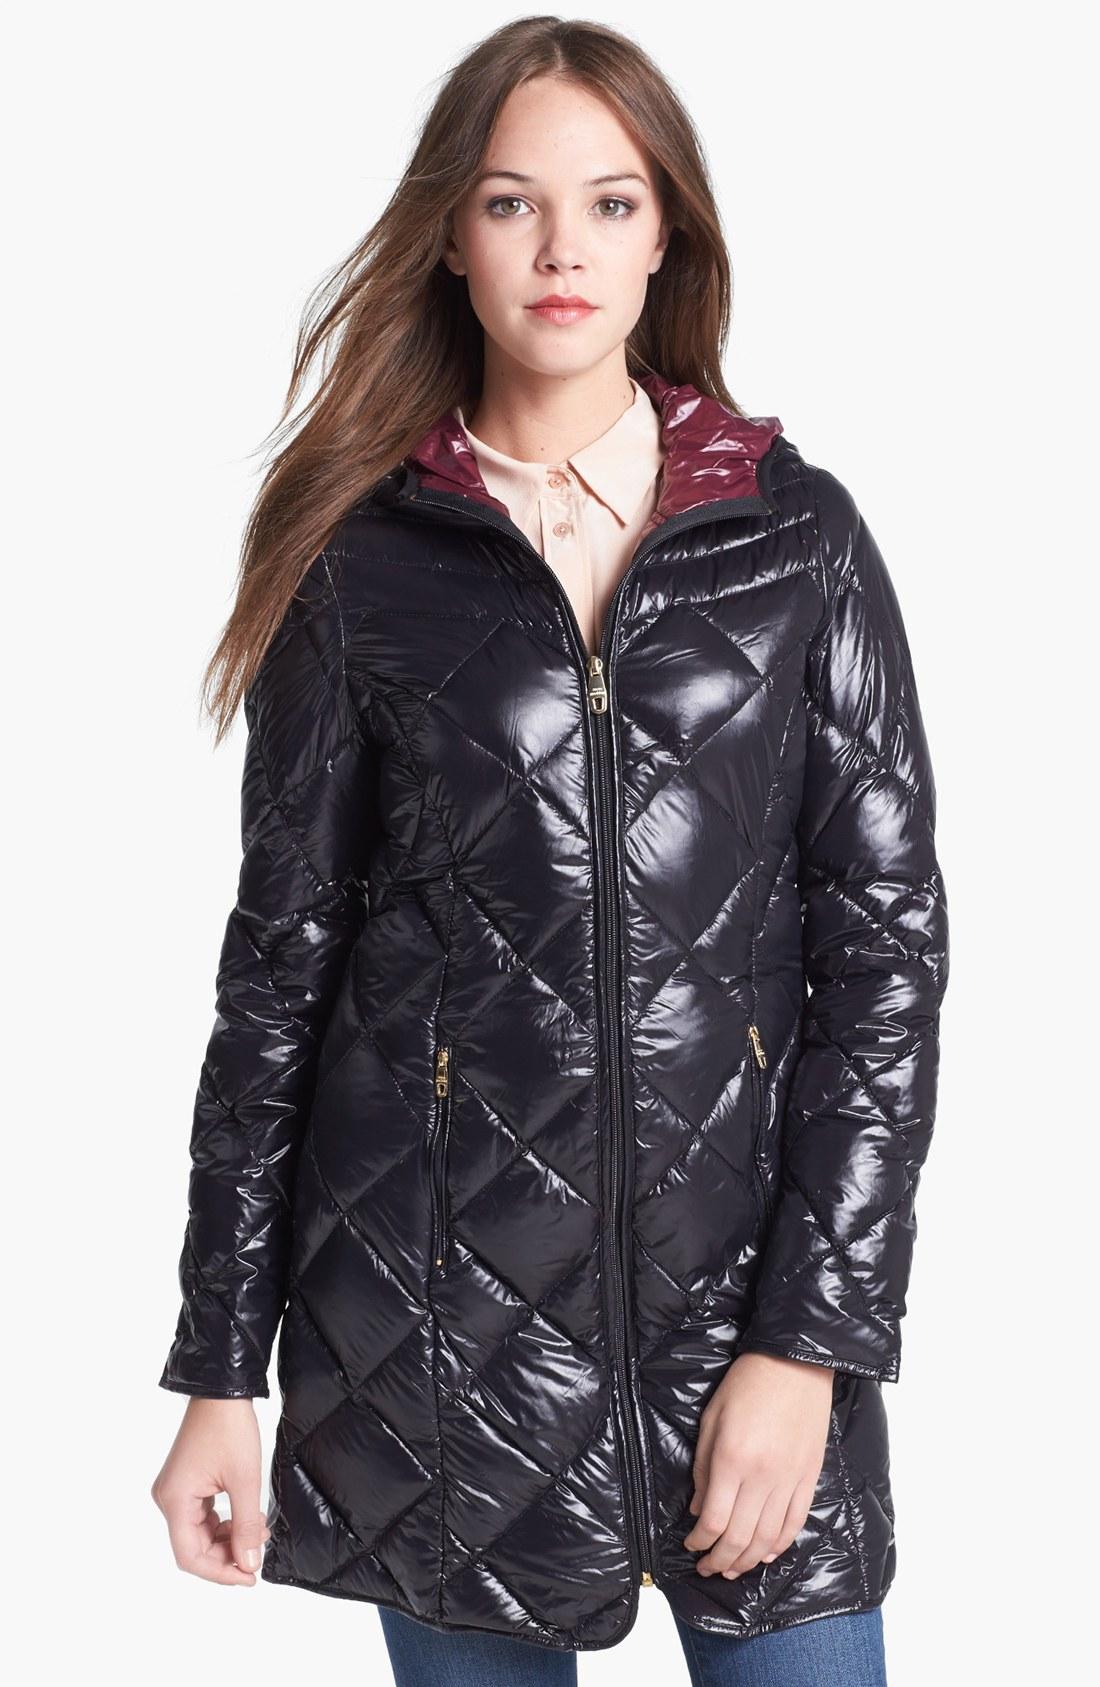 Tommy Hilfiger Womens Hooded Down Jacket Black Large